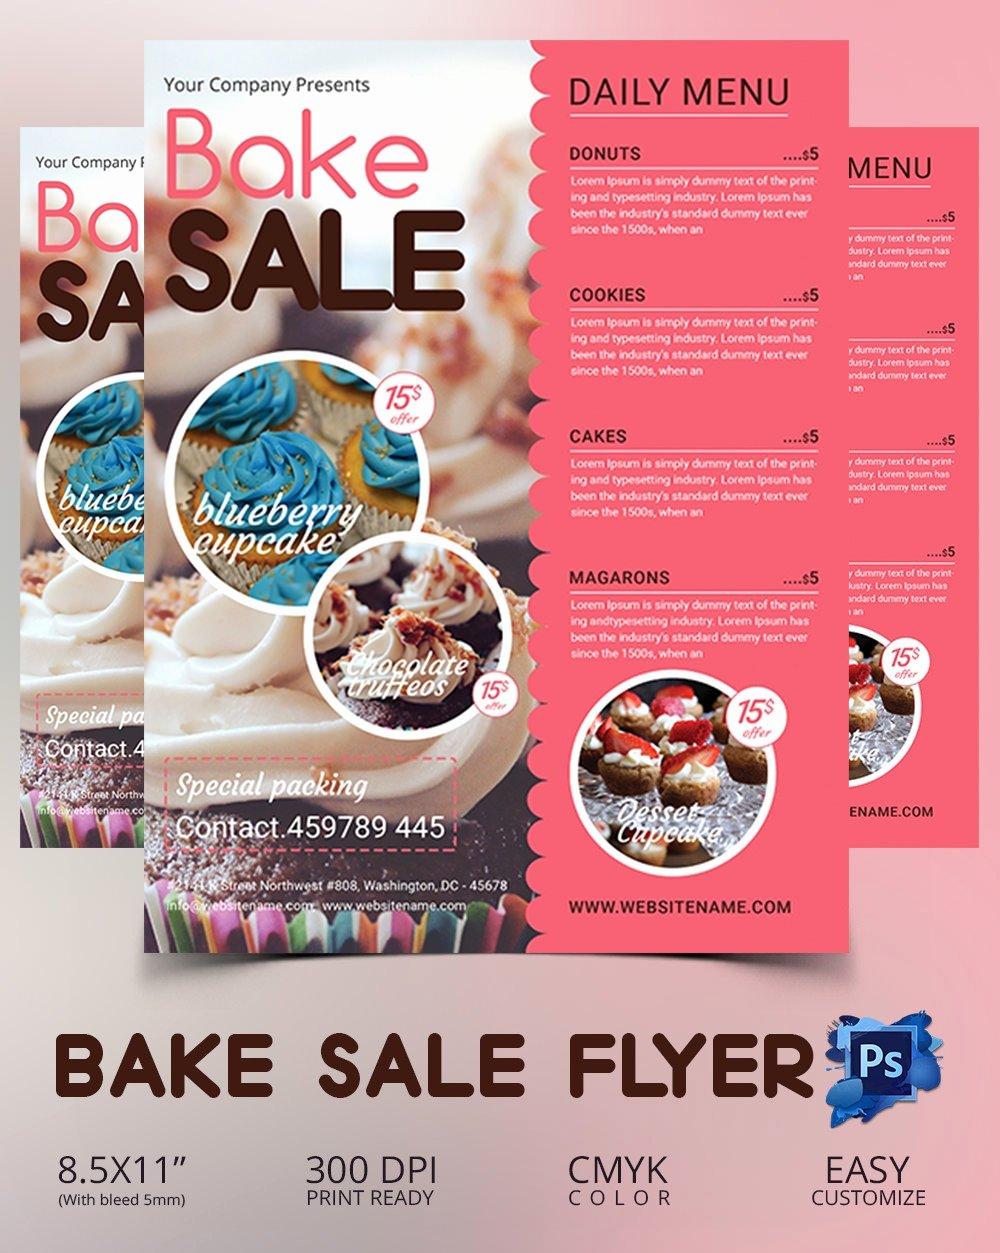 Free Bake Sale Template Elegant Bake Sale Flyer Template 34 Free Psd Indesign Ai